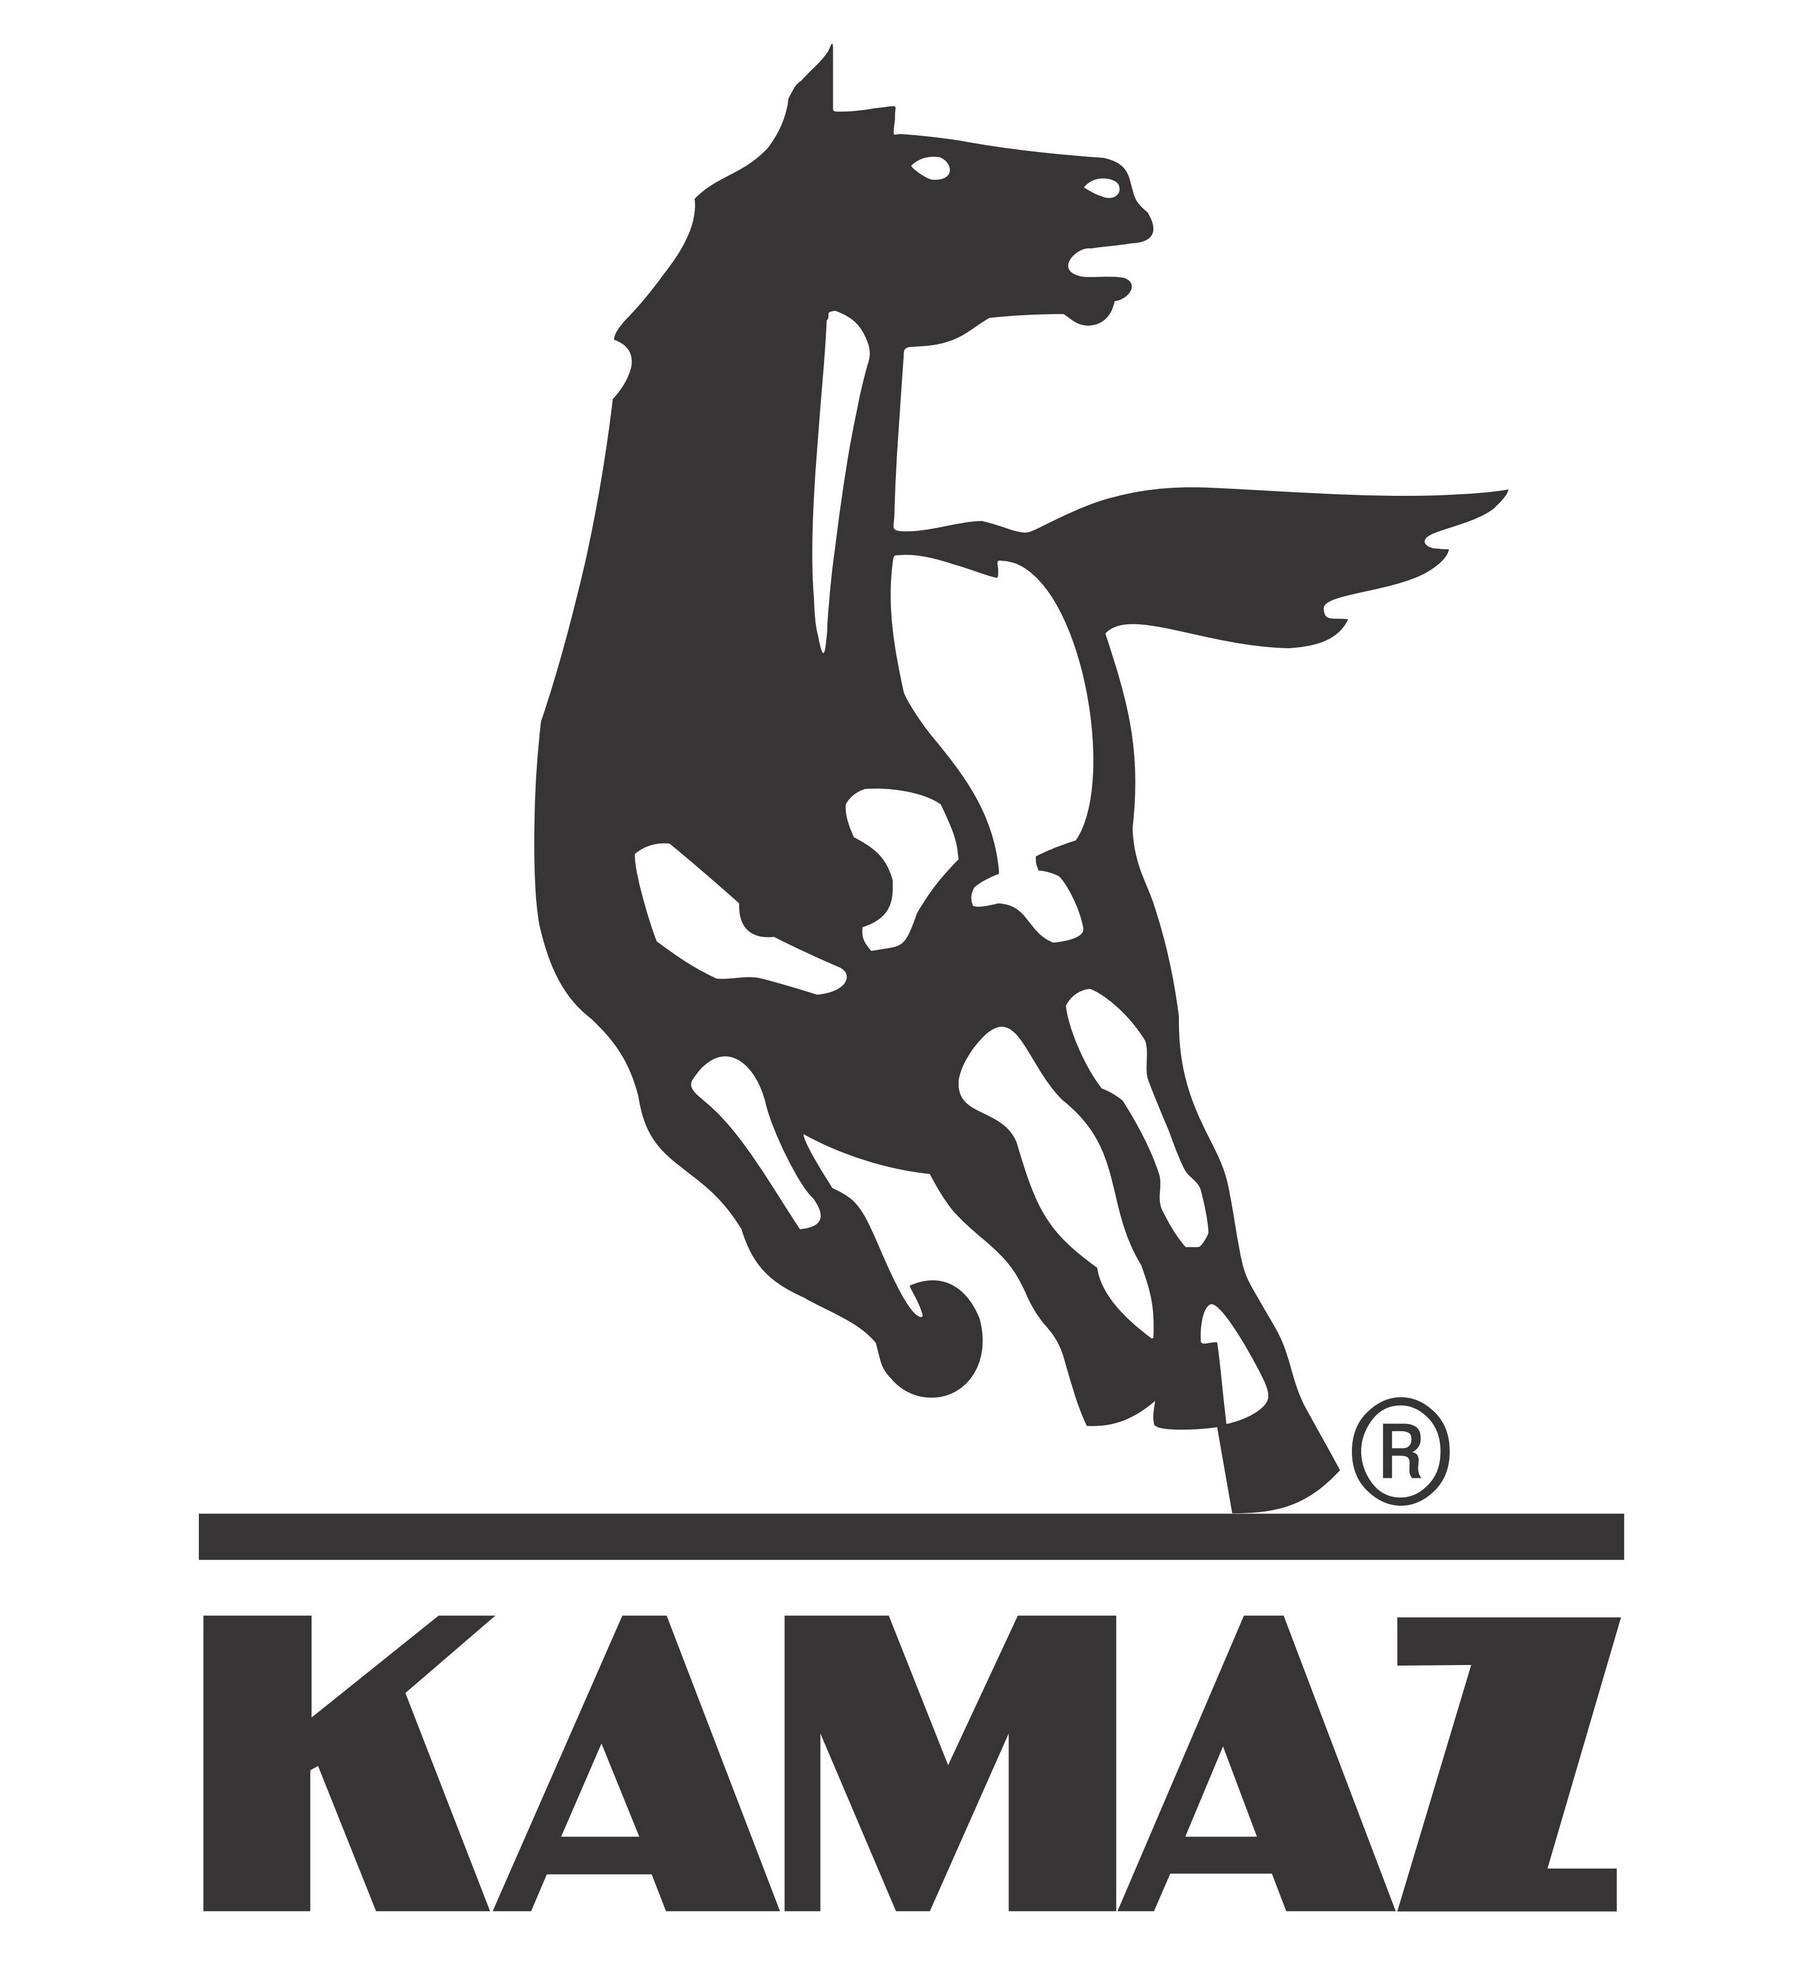 Kamaz logo wallpapers HD